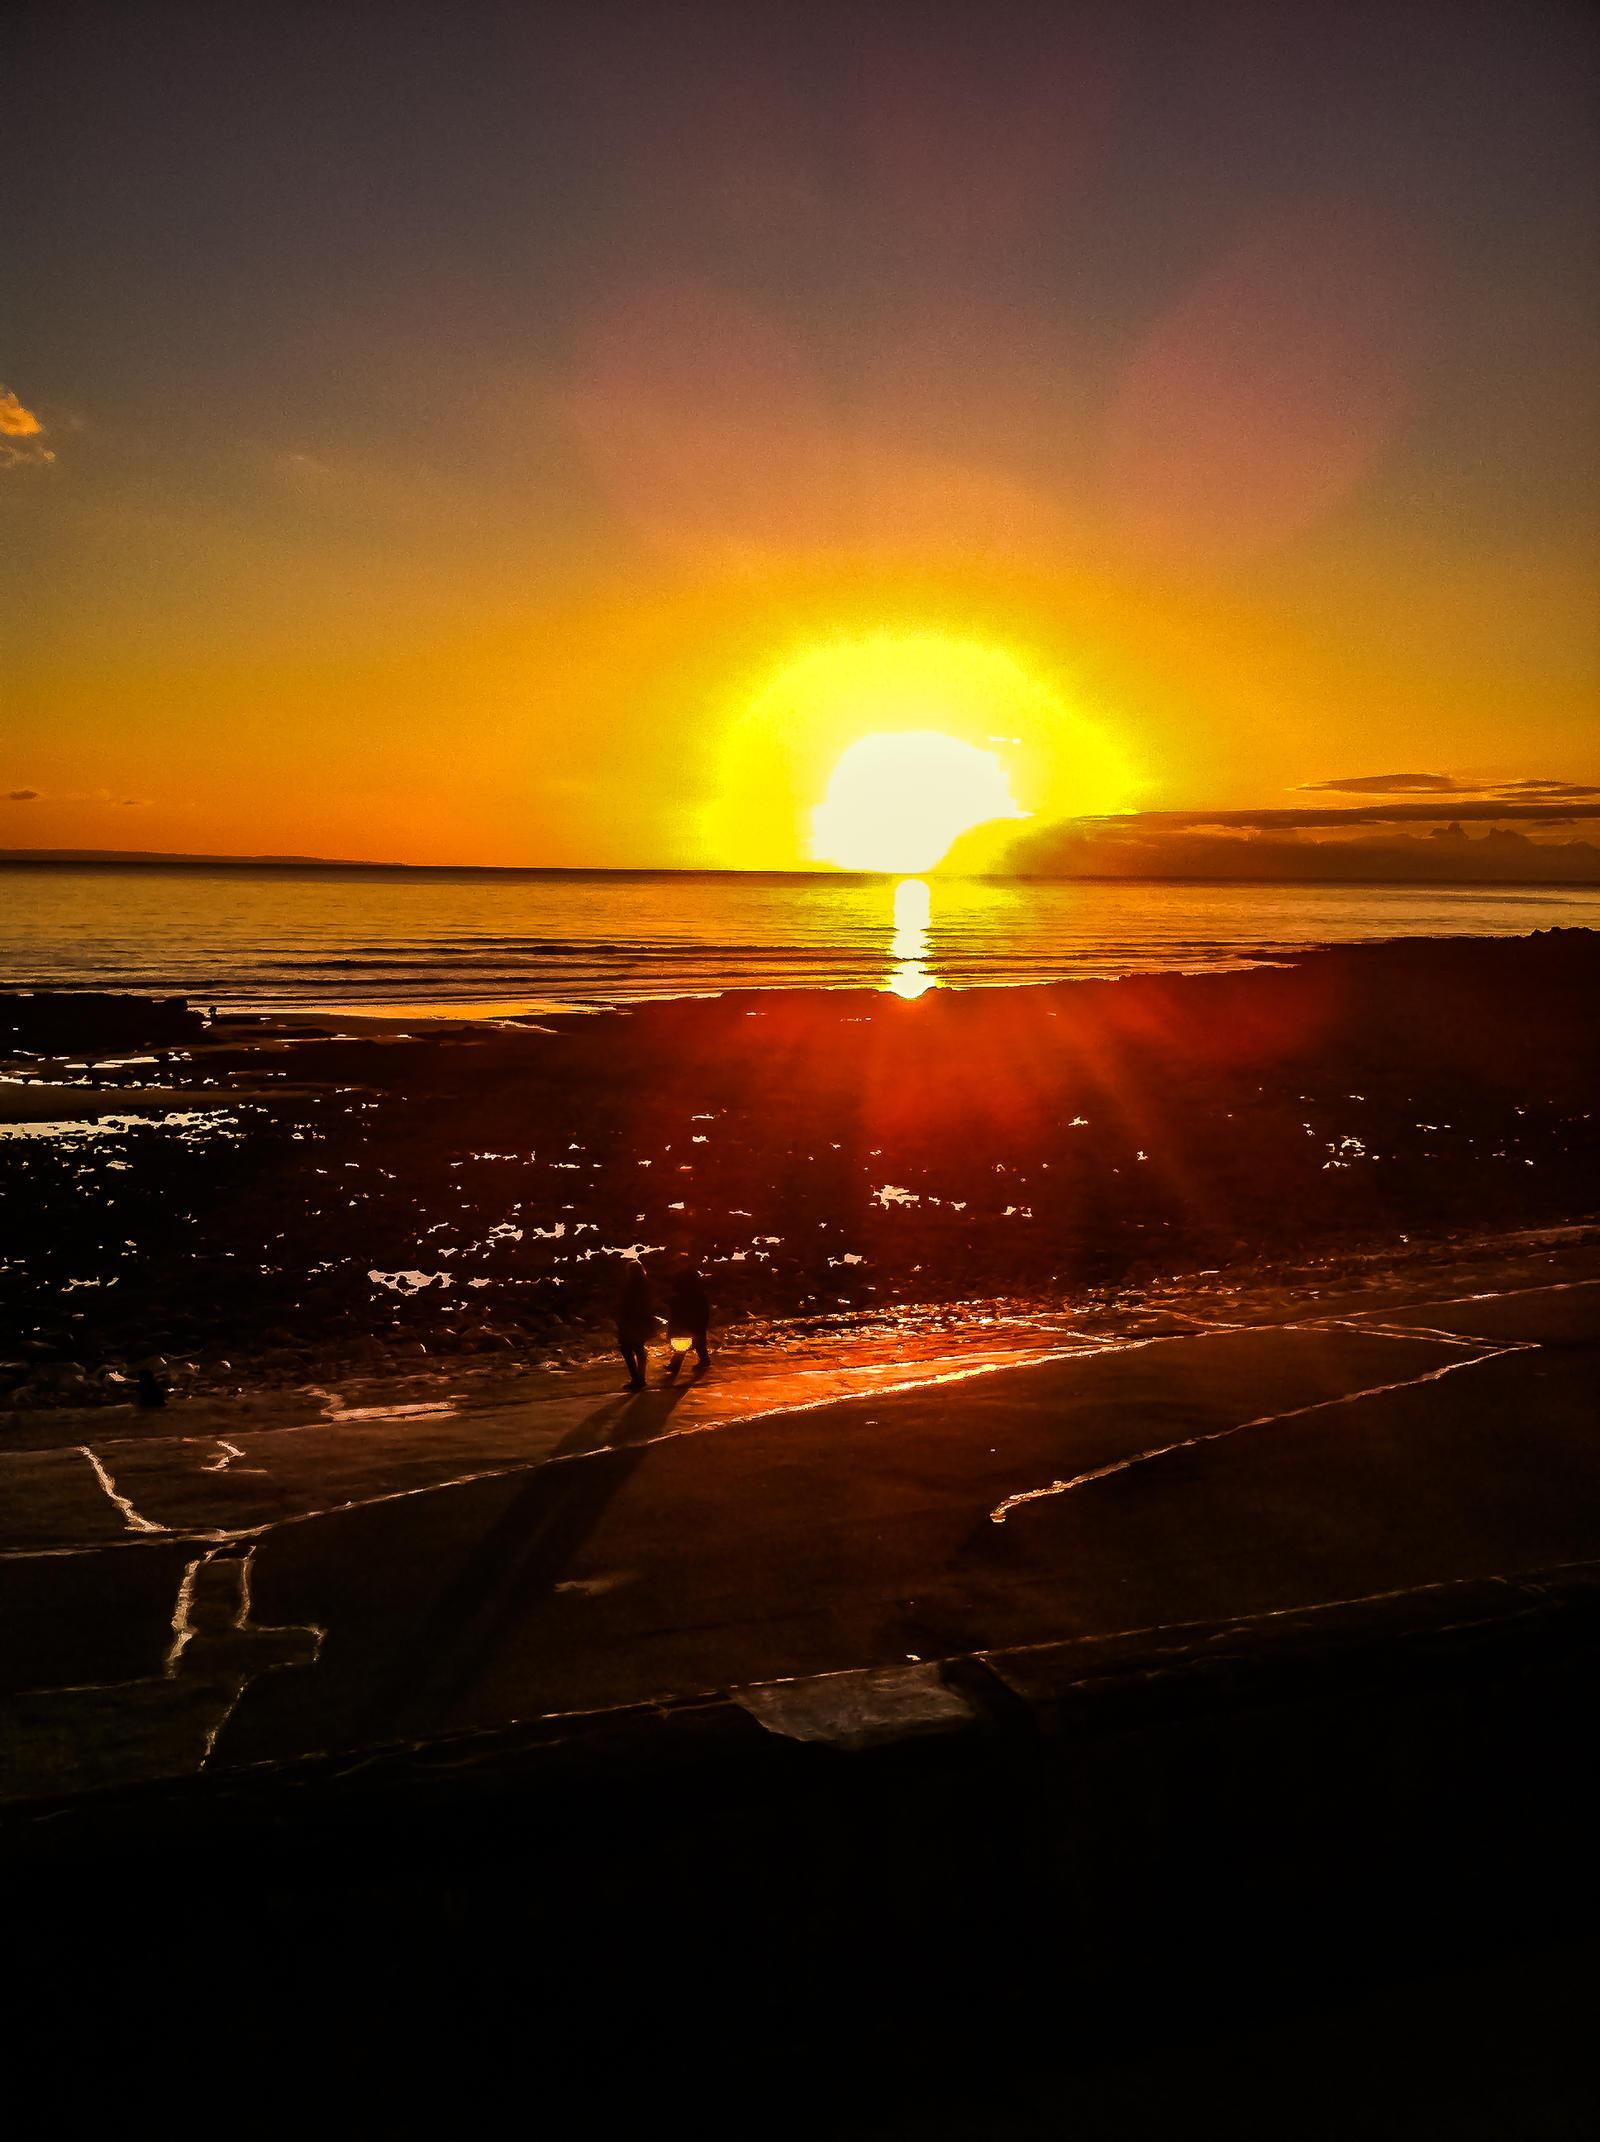 Sunset Overlooking Porthcawl Town Beach Nov 2012 by welshrocker